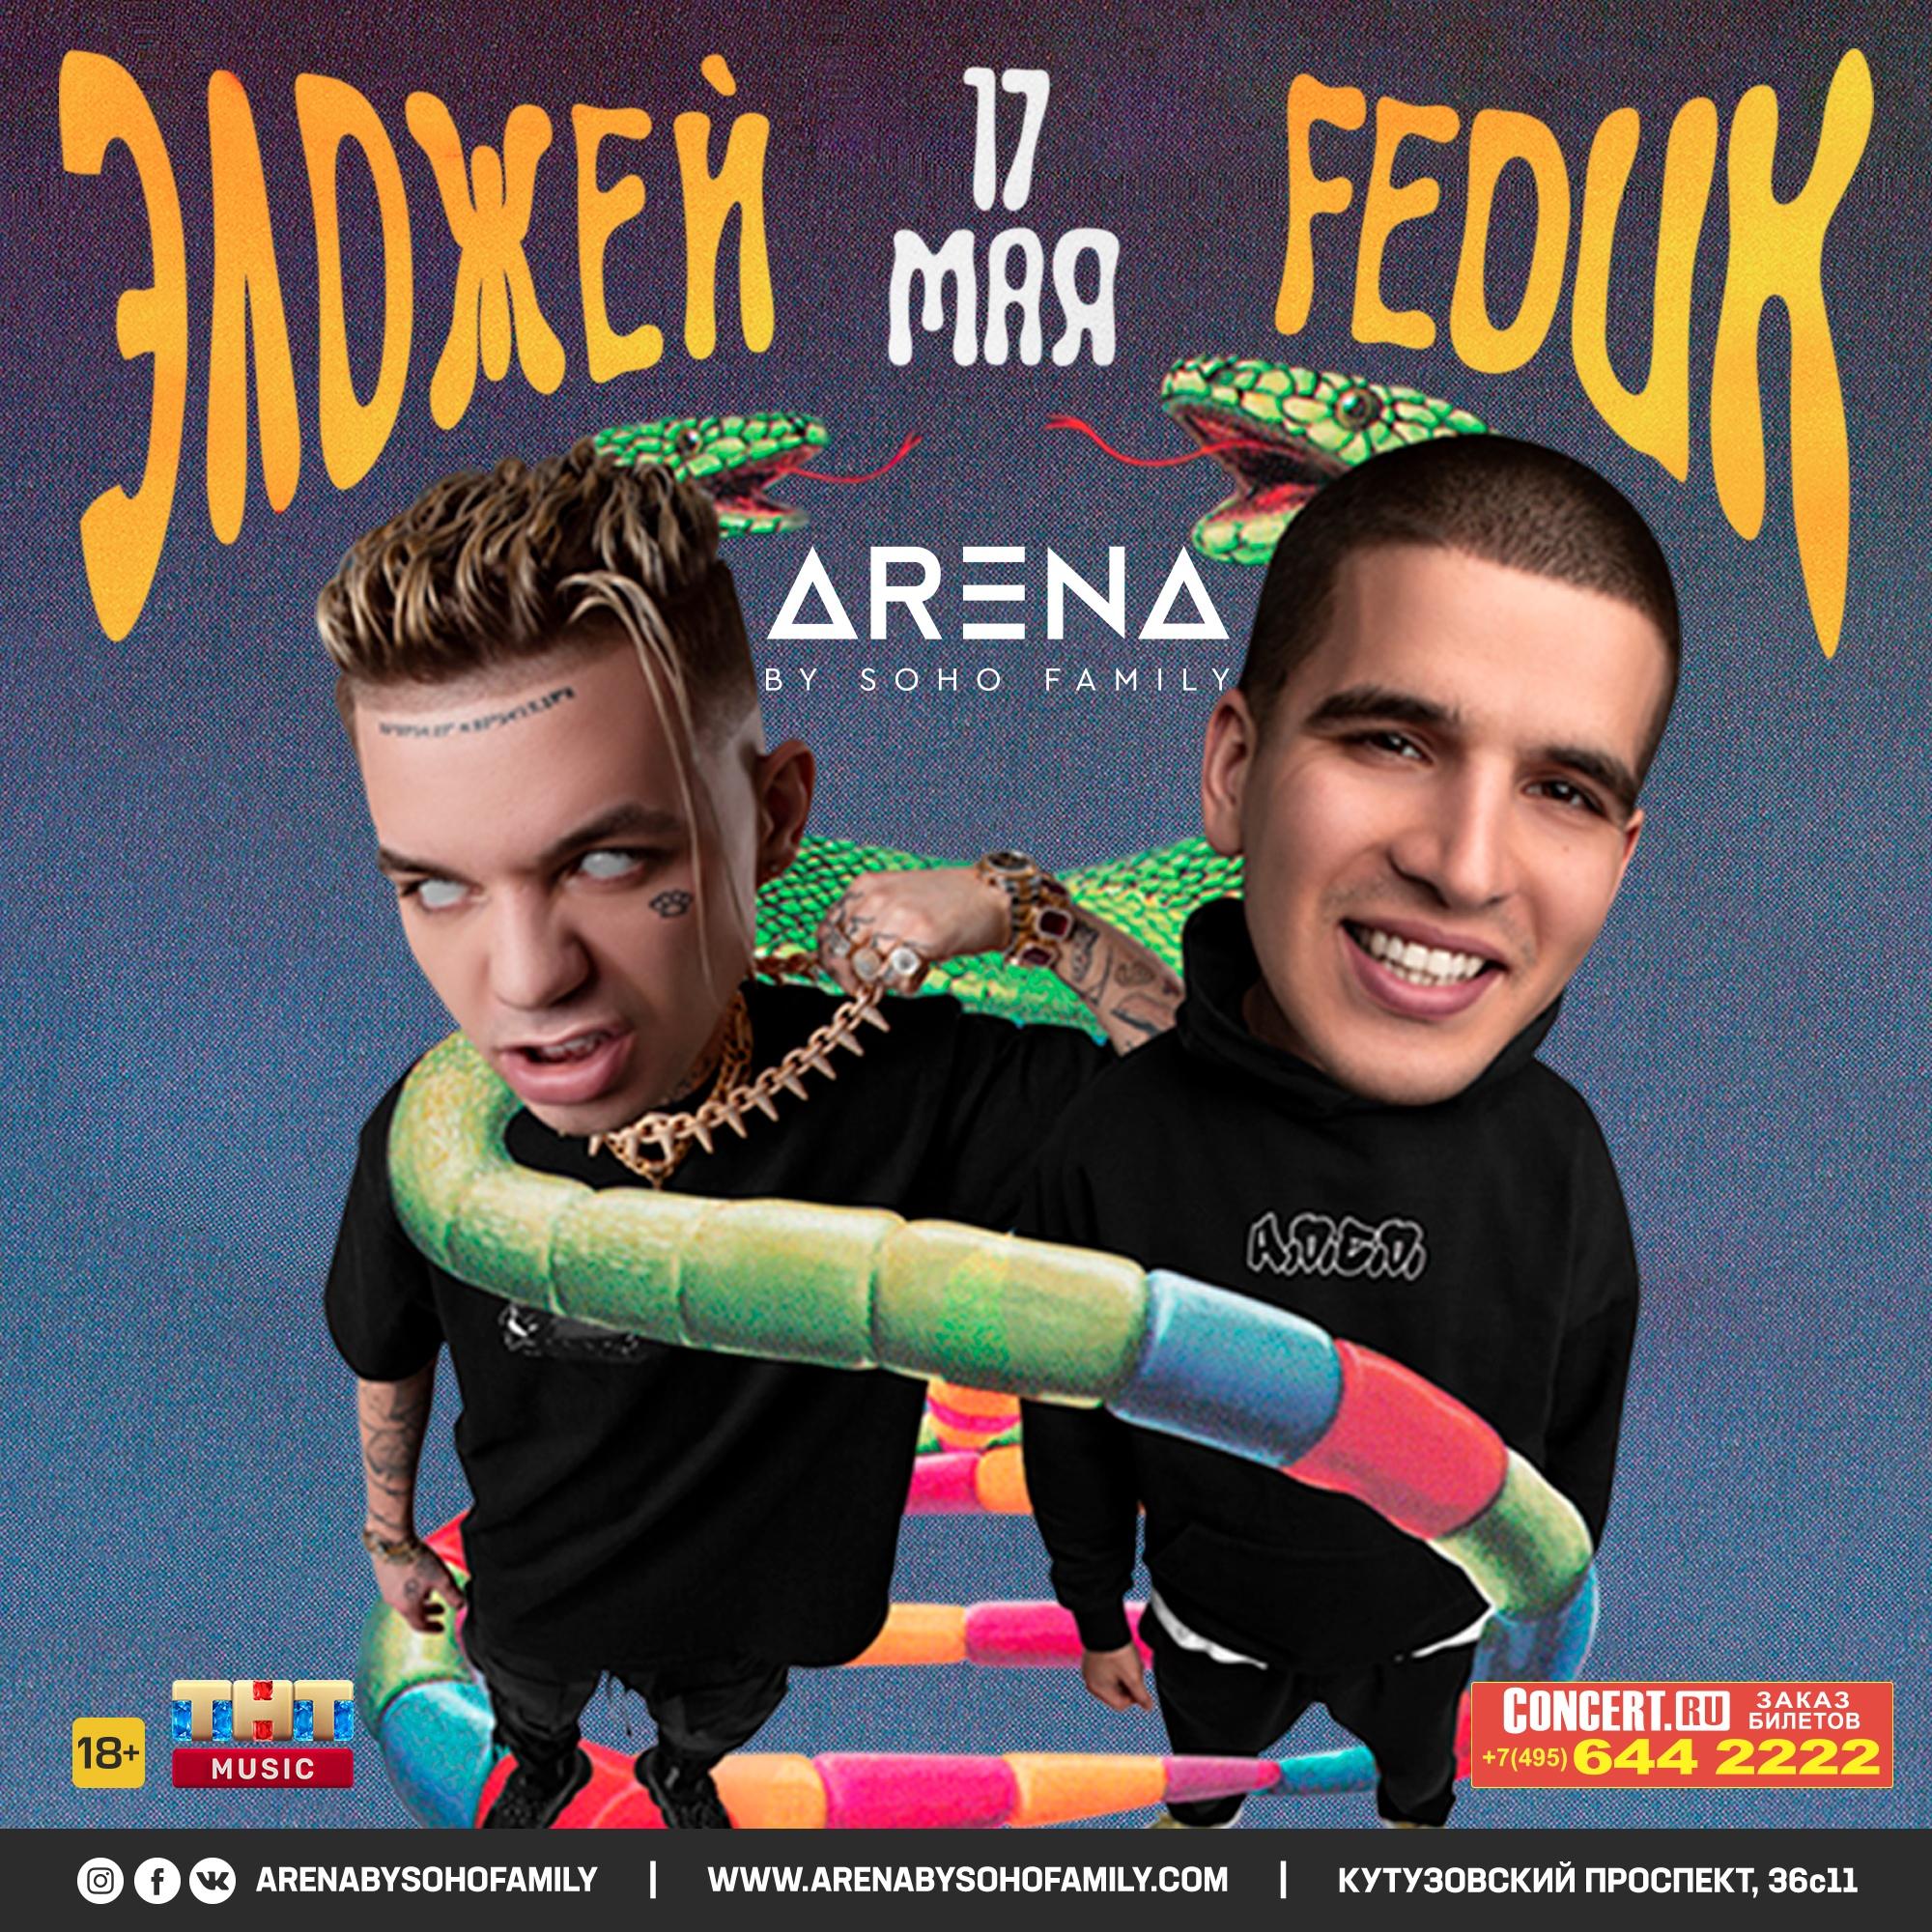 Feduk & Элджей